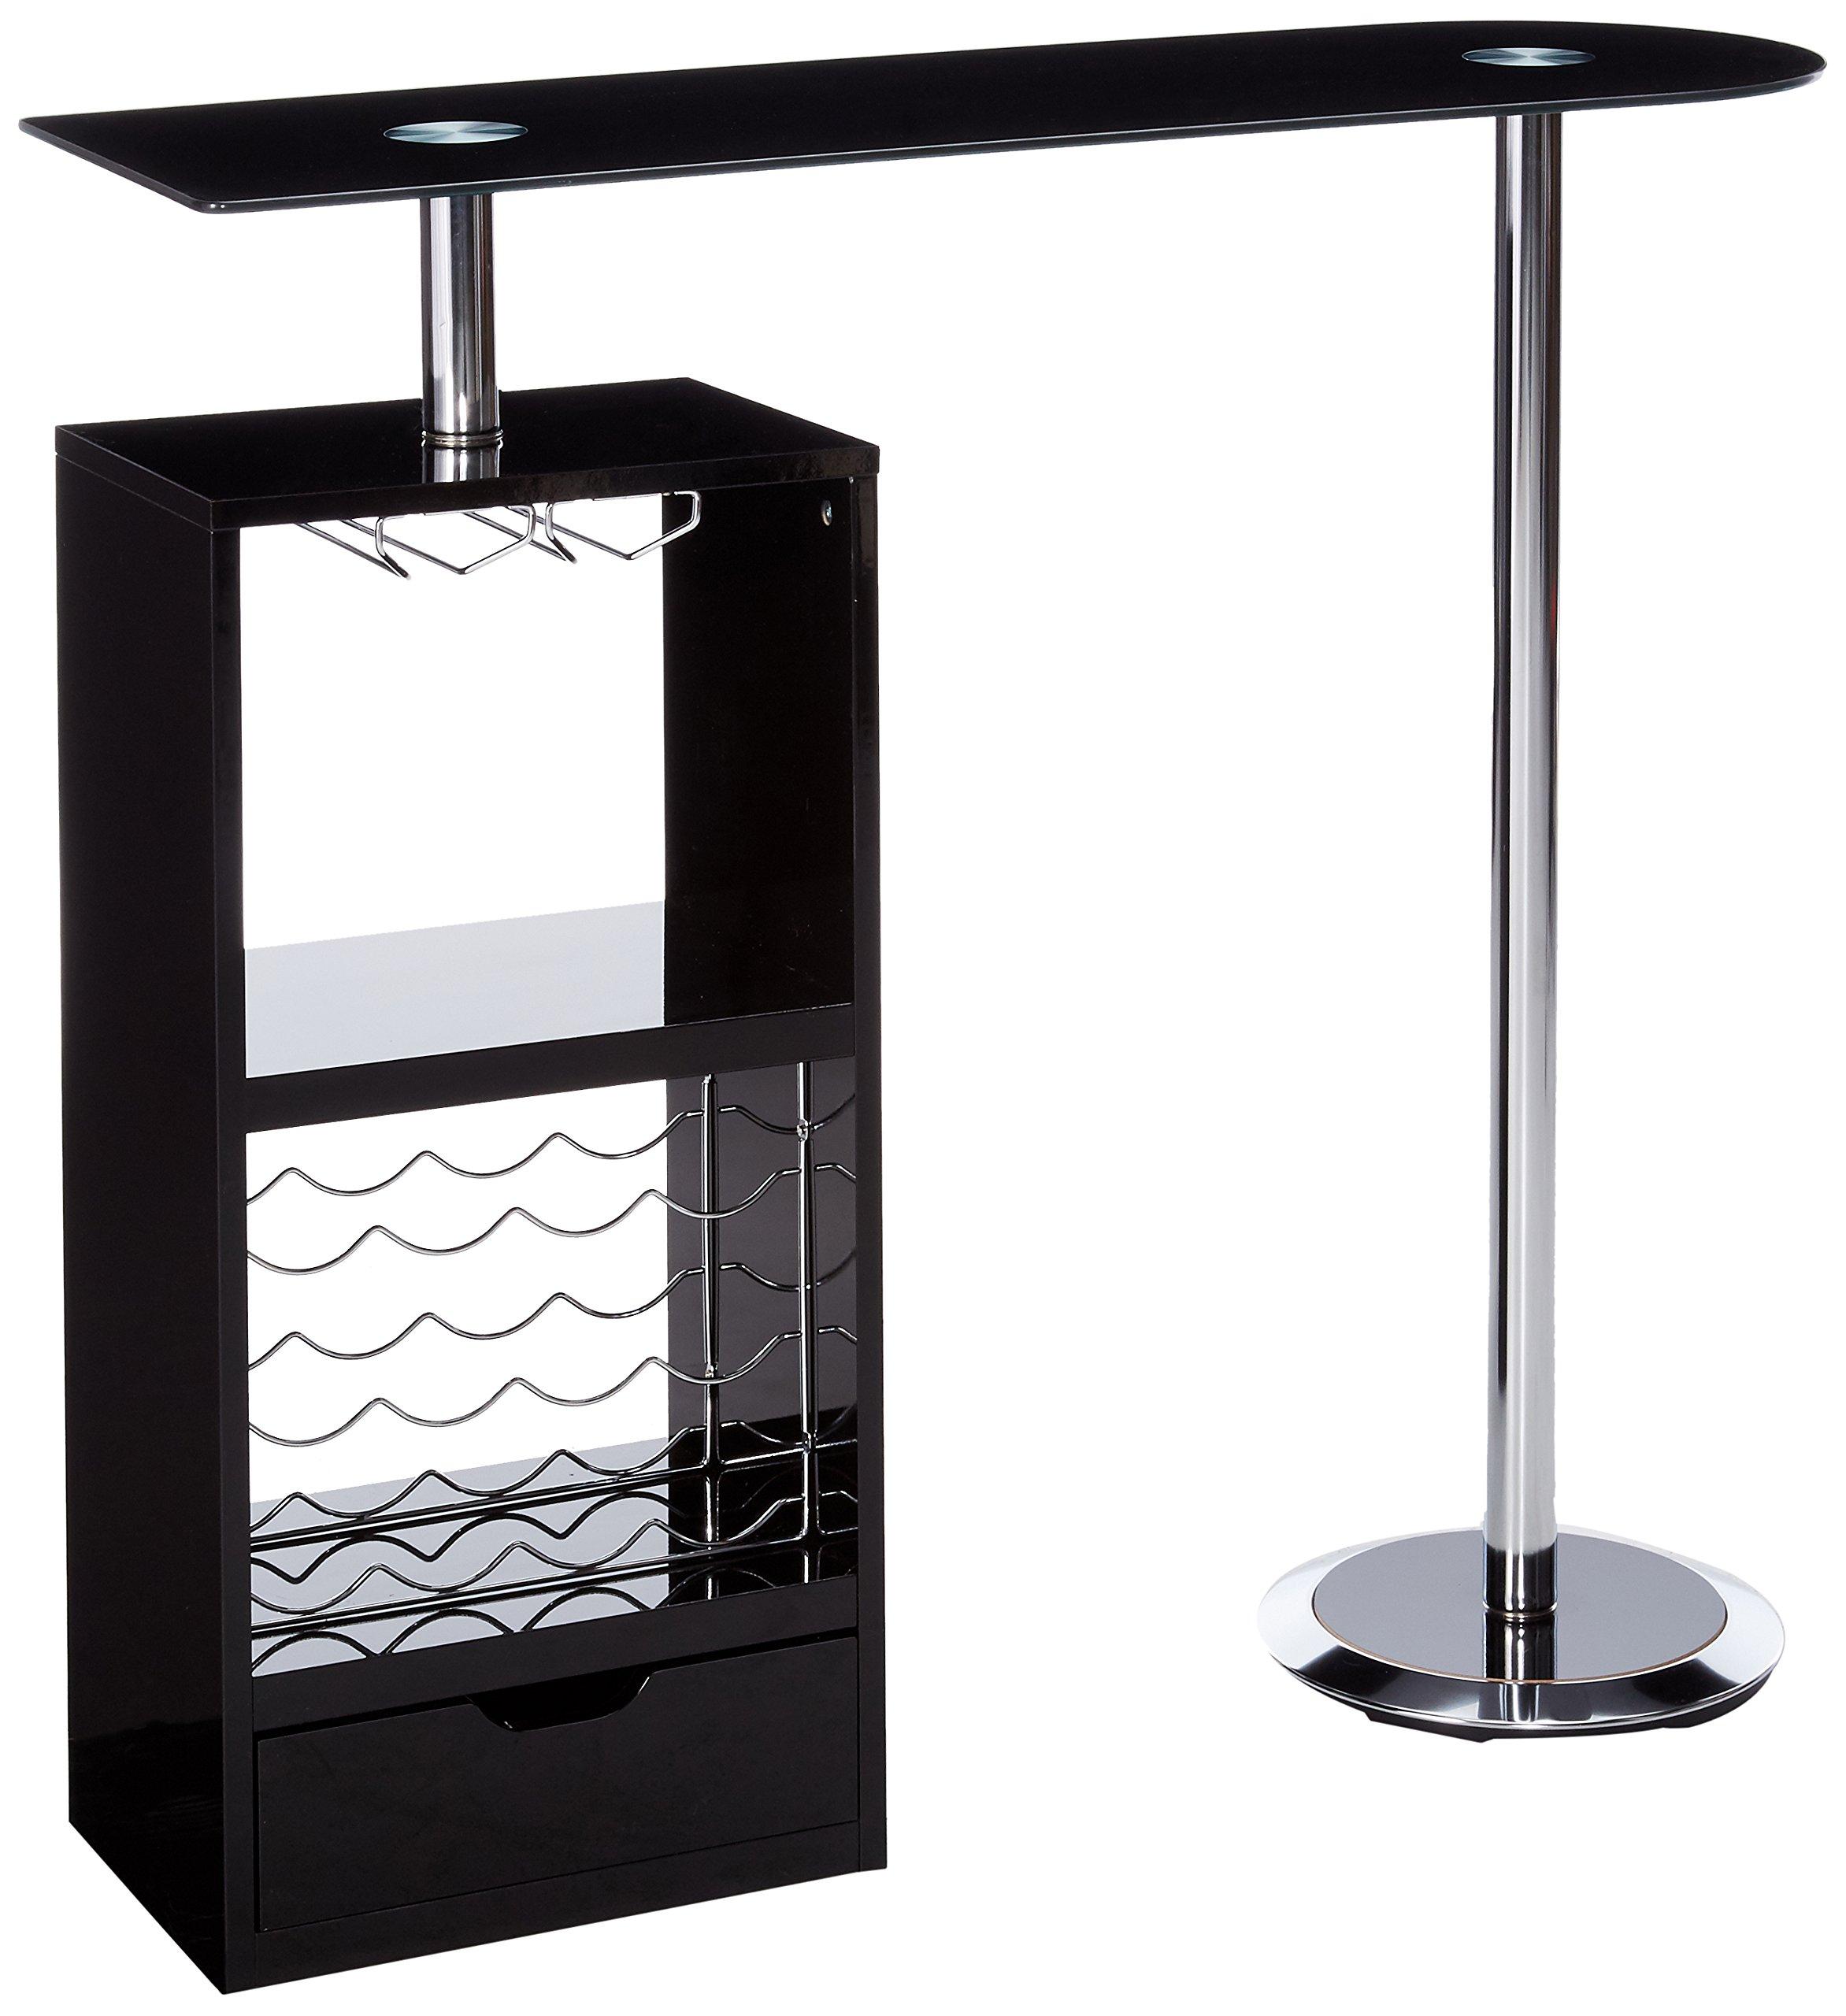 Coaster Home Furnishings Transitional Bar Table, Black